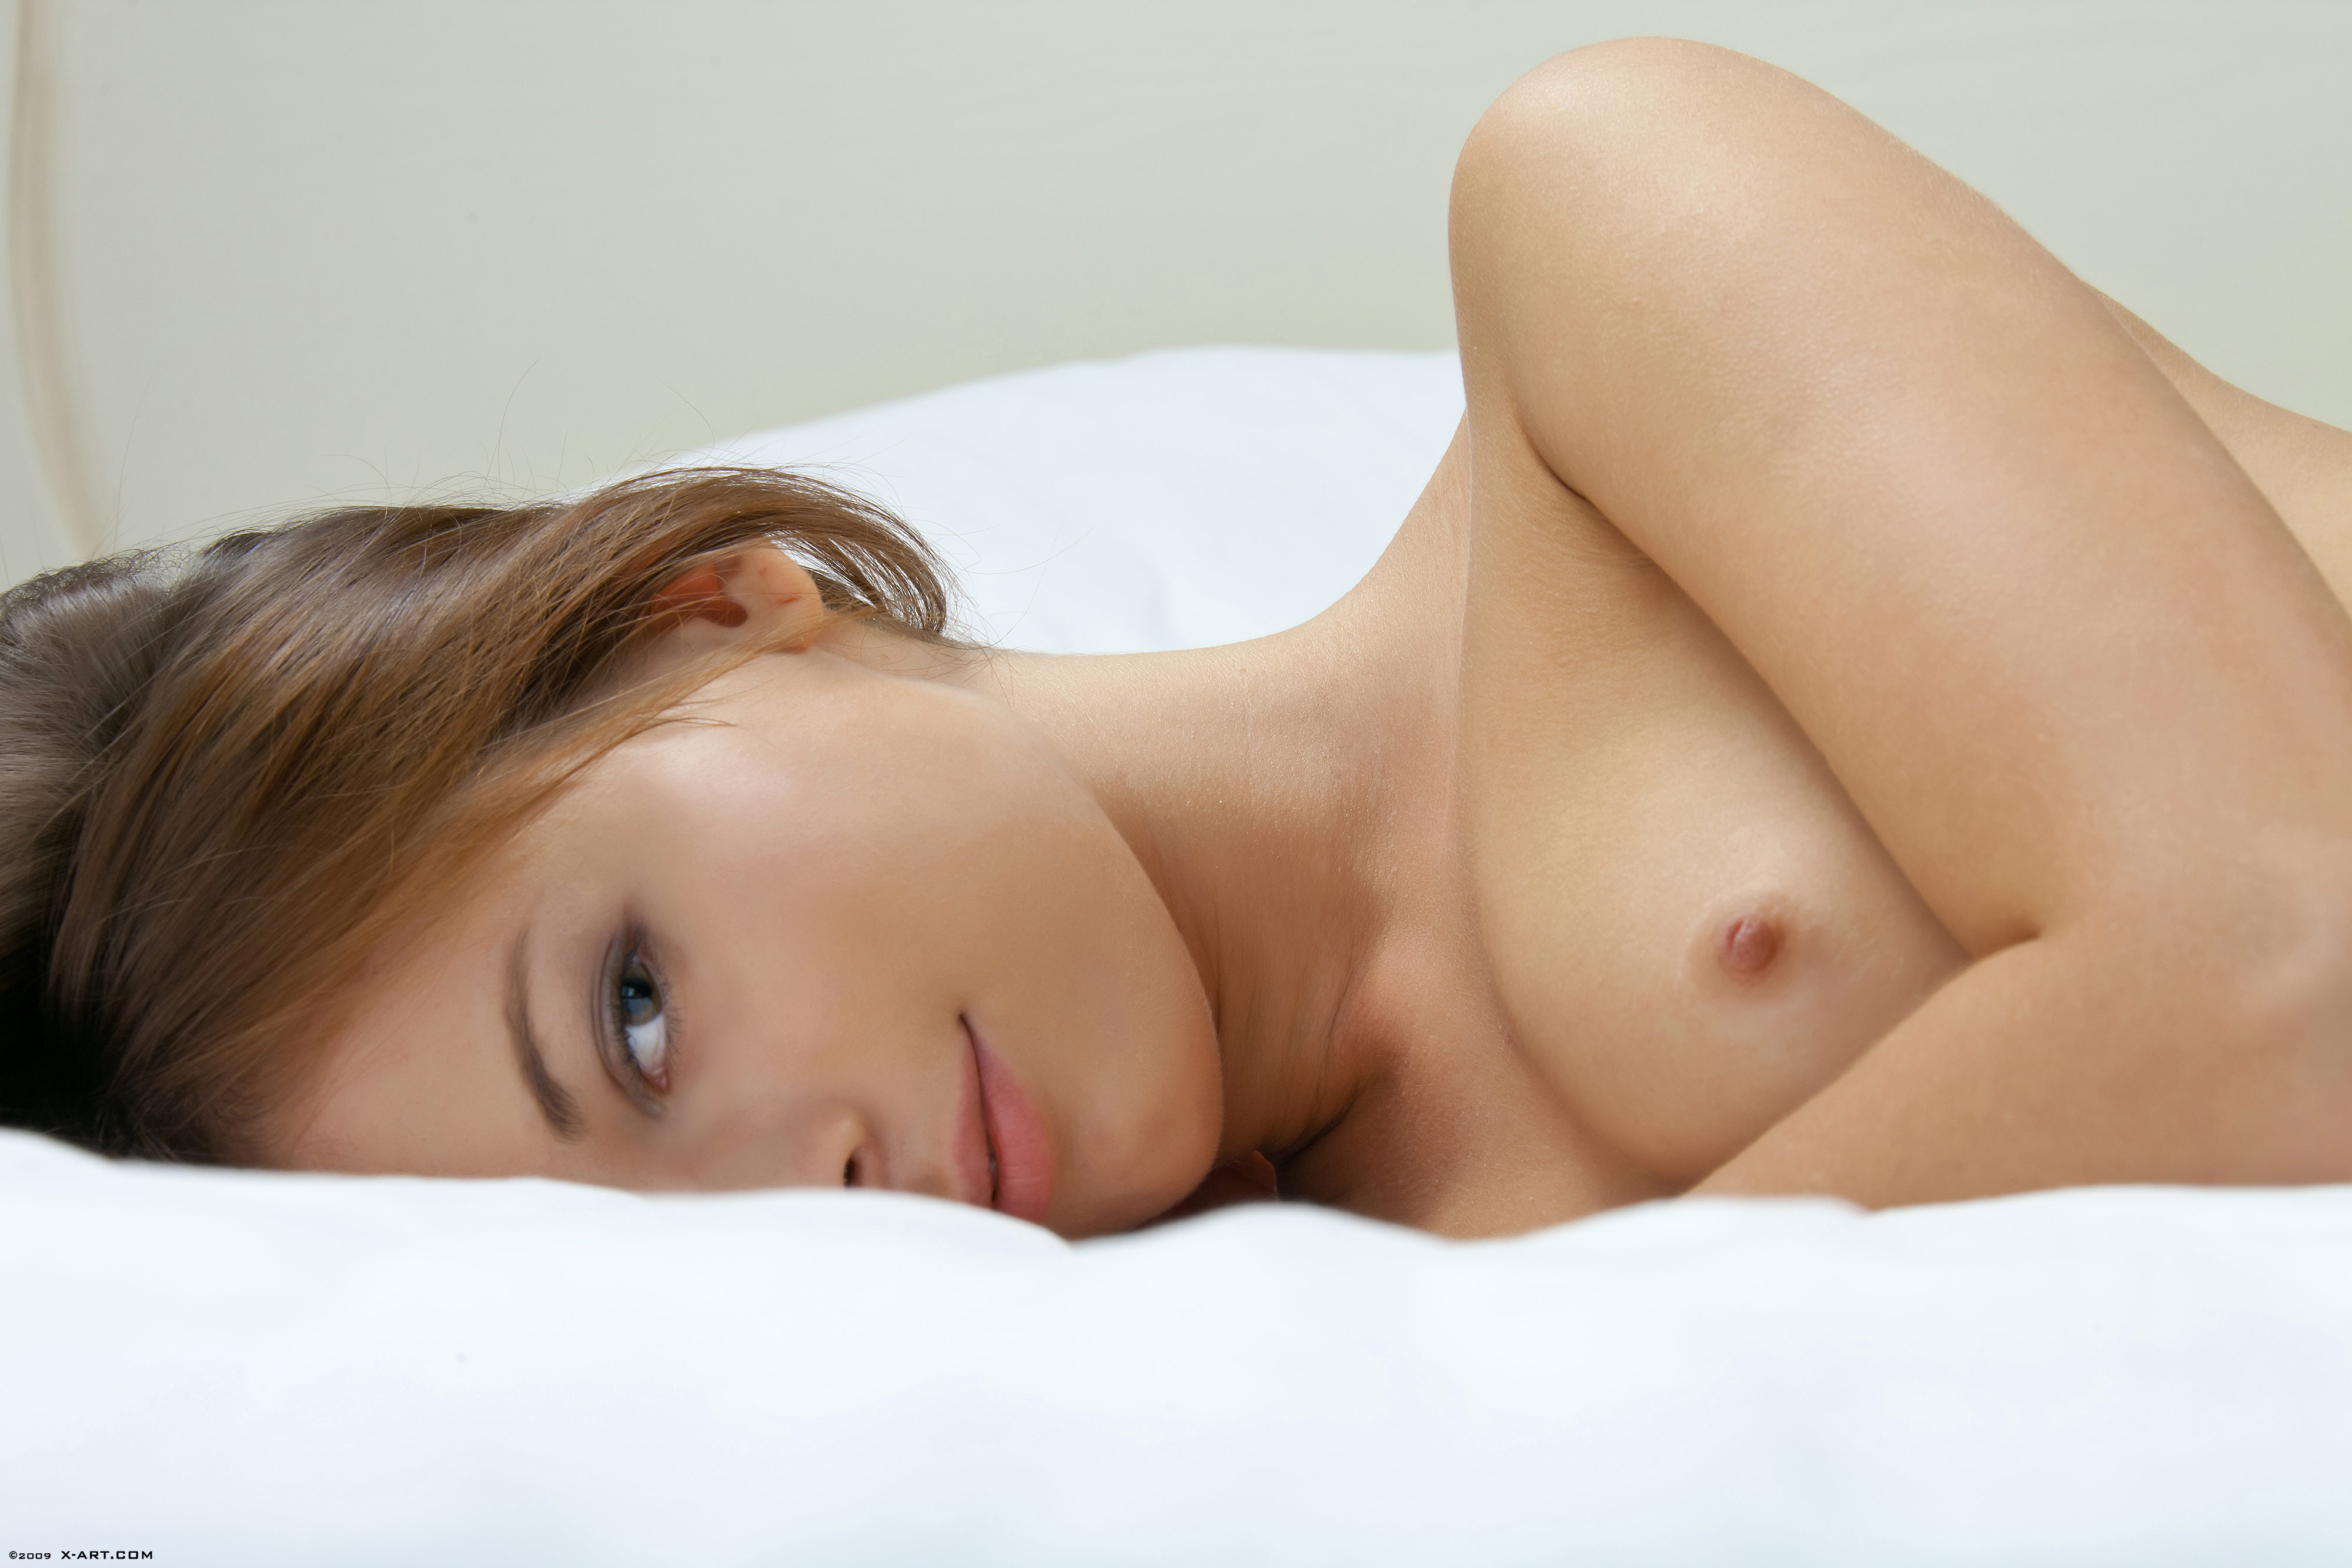 modeli-x-art-foto